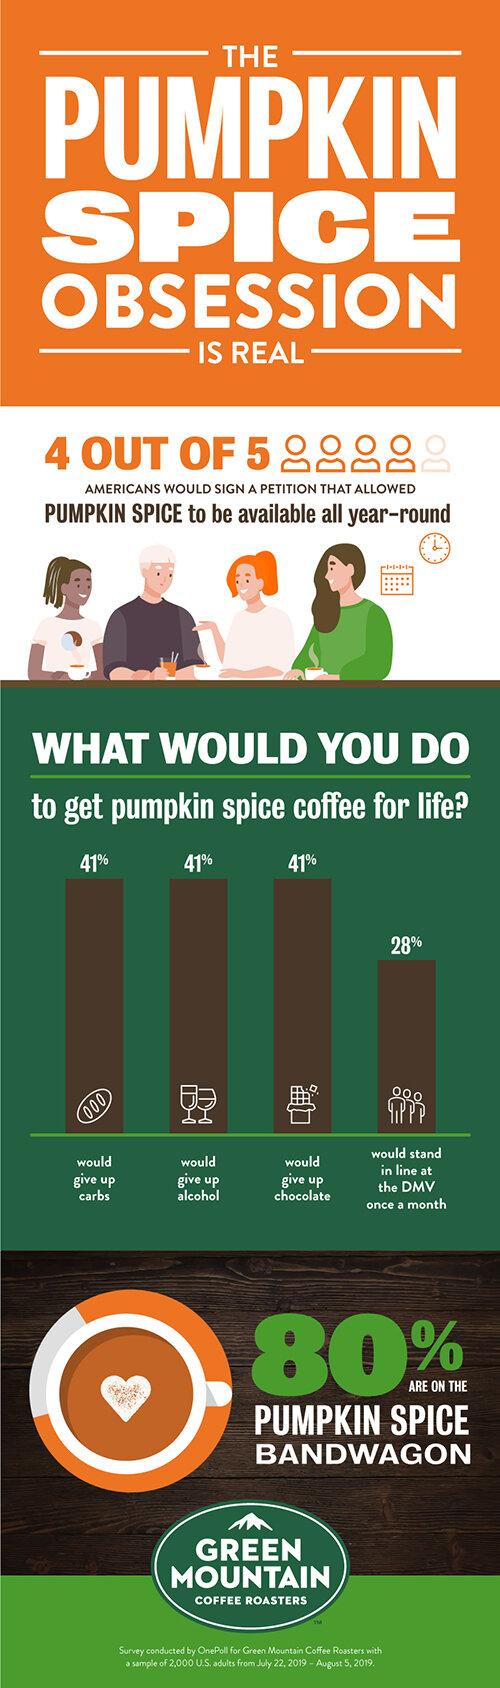 pumpkin-spice-obsession-v2.jpg